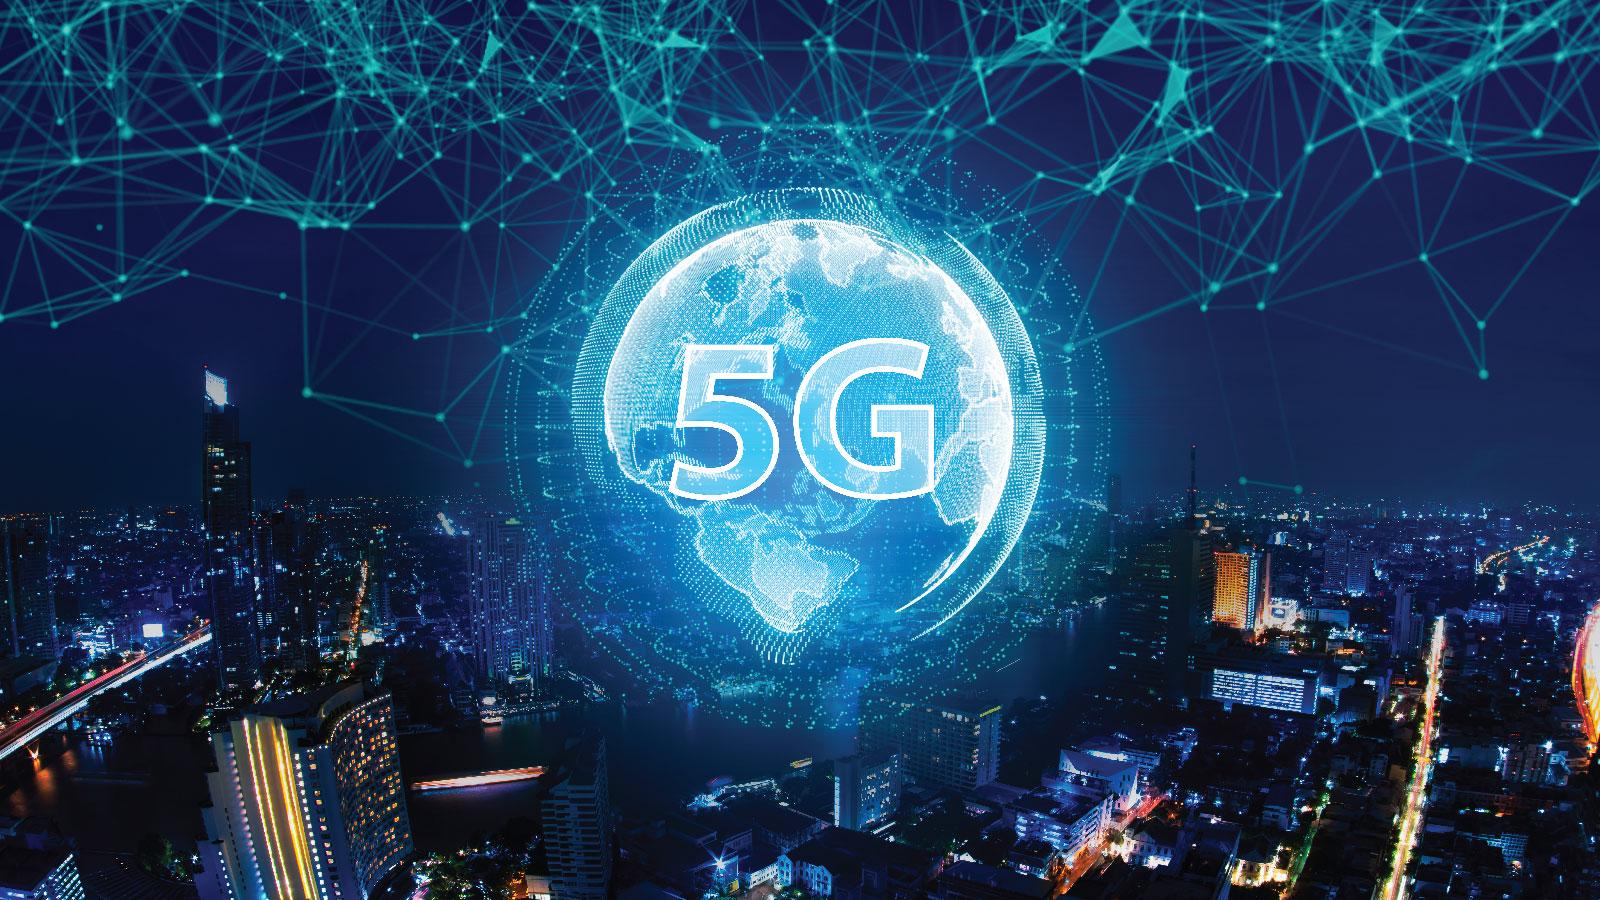 5G, 5G Technology, Digital Transformation, Industry 4.0, Intelligent Connectivity Platform, 5G Tech, 3rd Generation Partnership Project (3GPP), Telecommunication, 4G, 4G LTE networks, Australia, Europe, US, 2020, IoT, Asia, Augmented Reality, AR, Virtual Reality, VR, Industrial automation, IoT, Telecom, Broadband CEO, CTO, 5G, 5G Technology, Digital Transformation, Industry 4.0, Intelligent Connectivity Platform, IoT, Virtual Reality, VR